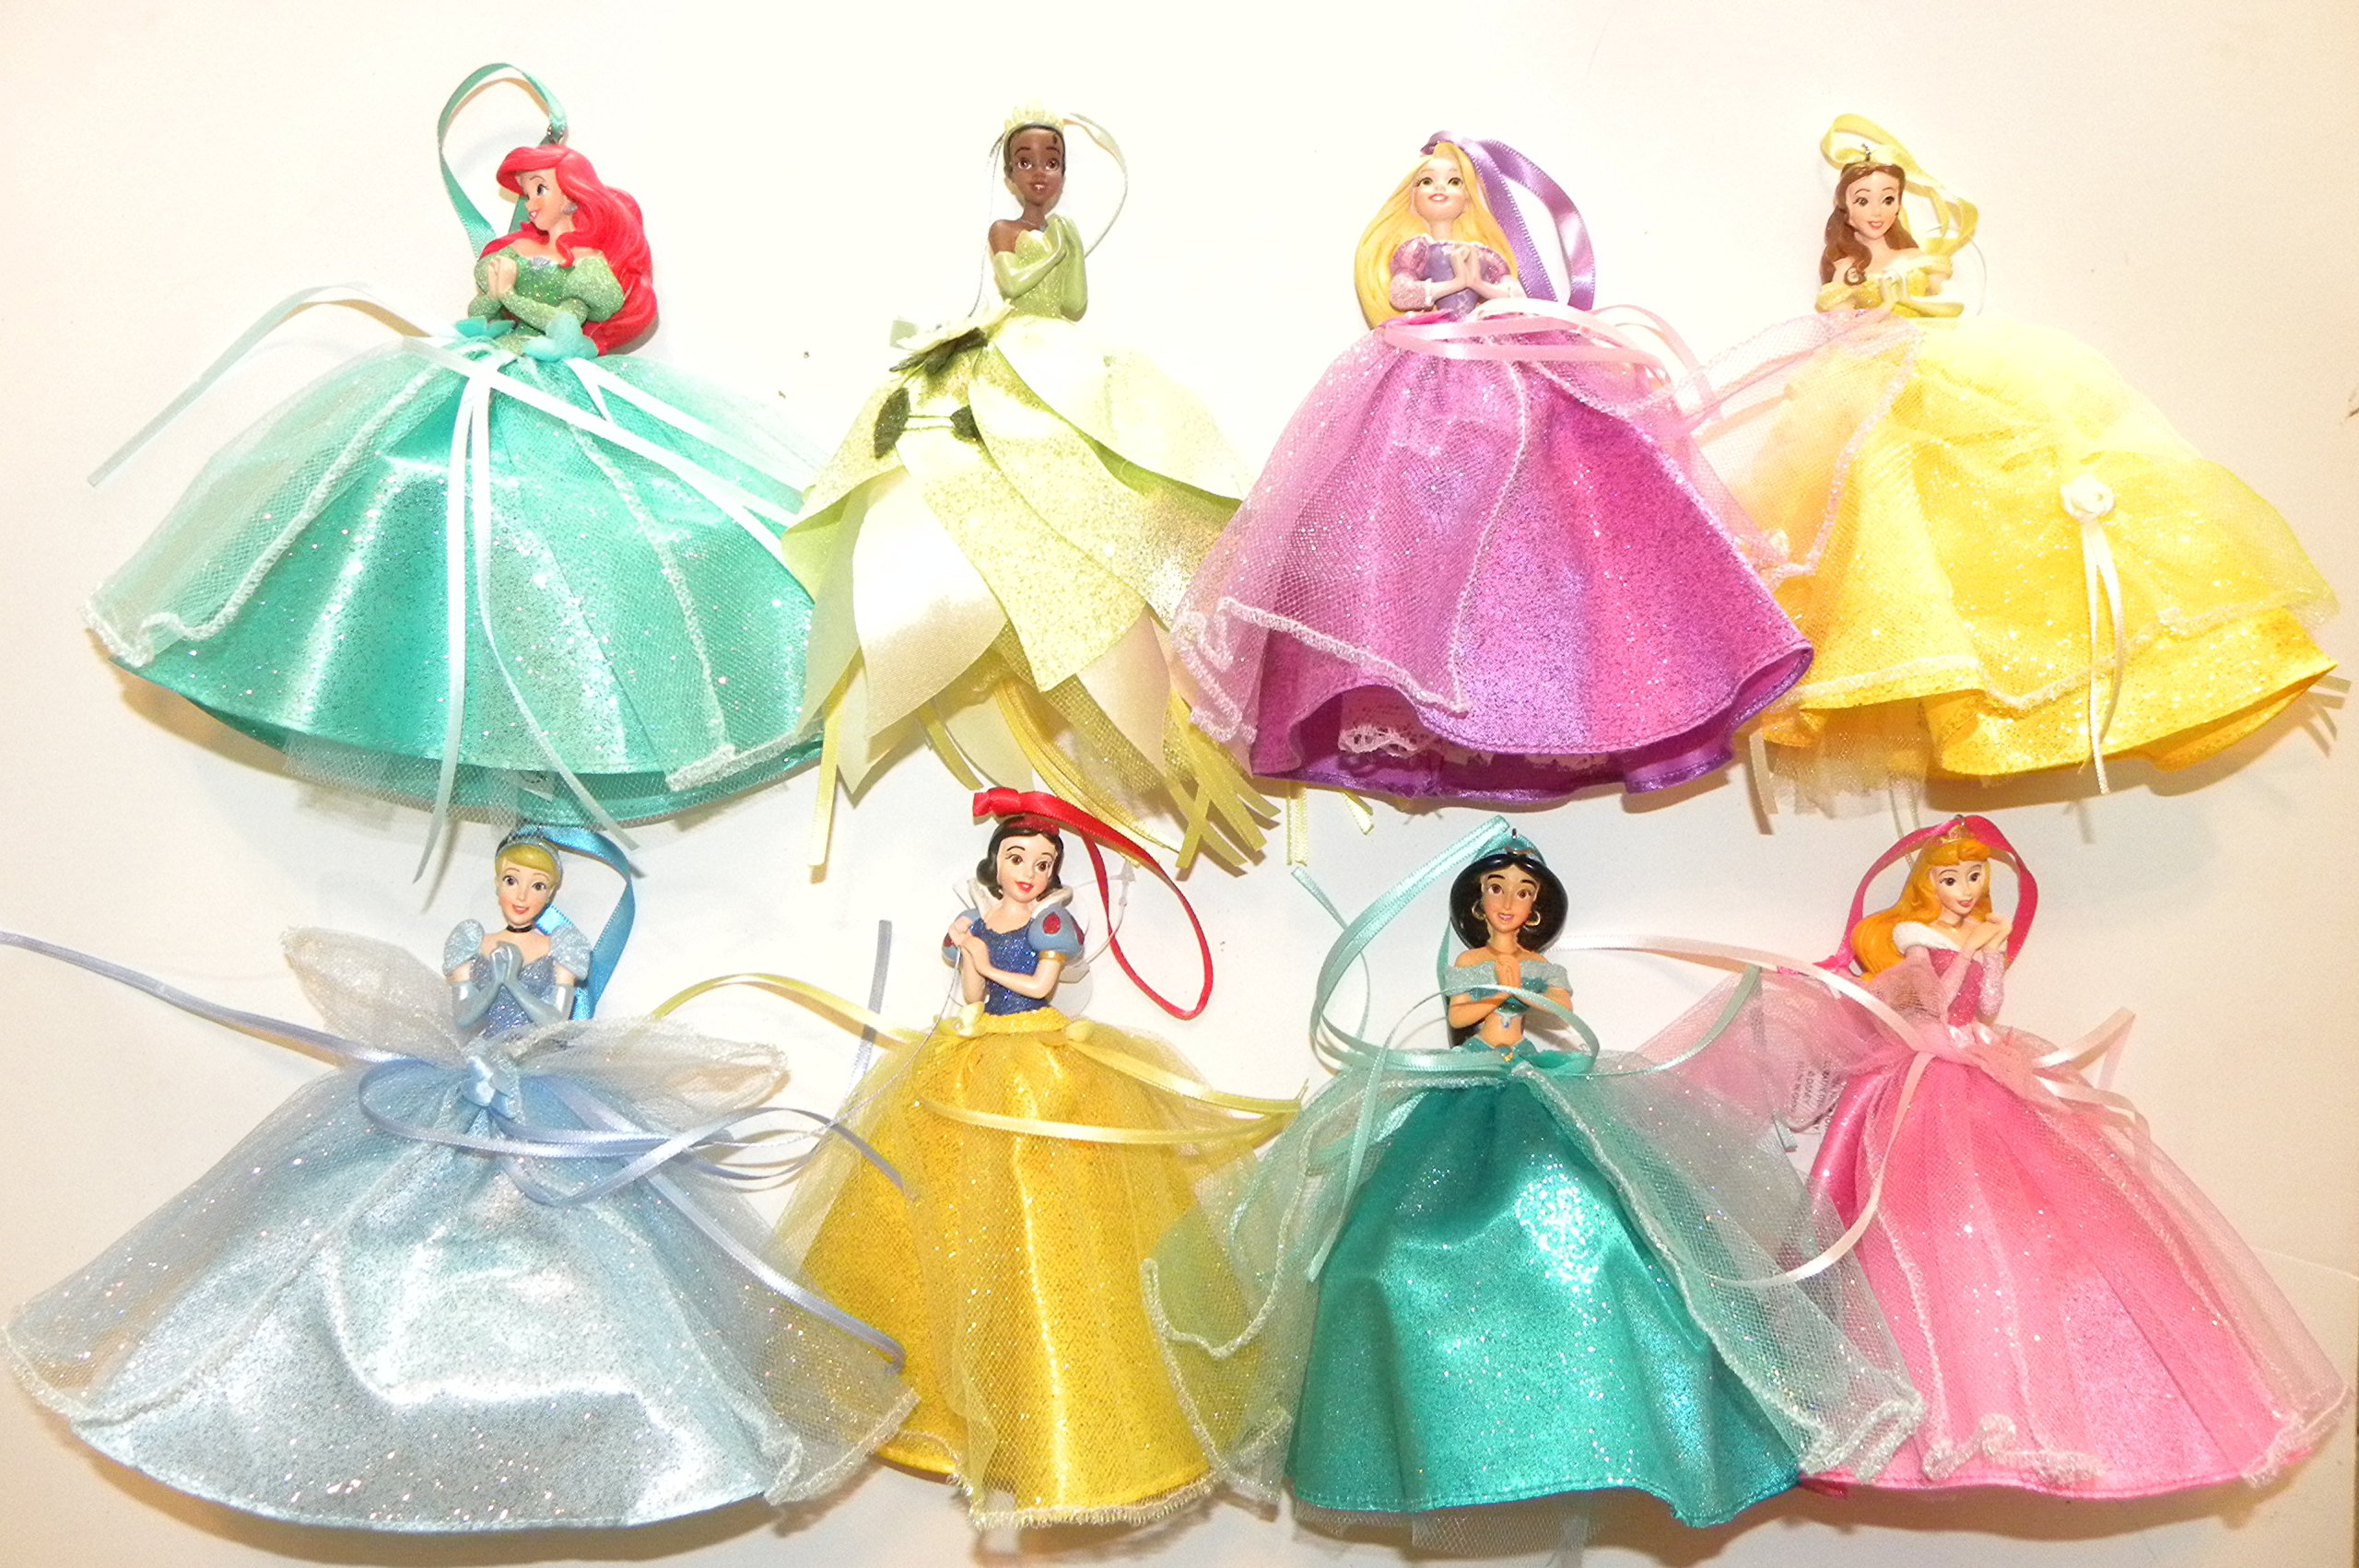 Disneyland Disney World WDW Parks Set All 8 2014 Princess Doll Evening Tuile Gown Dress Ariel Belle Jasmine Snow White Aurora Rapunzel Tiana Cinderella Holiday Ornaments Figurines